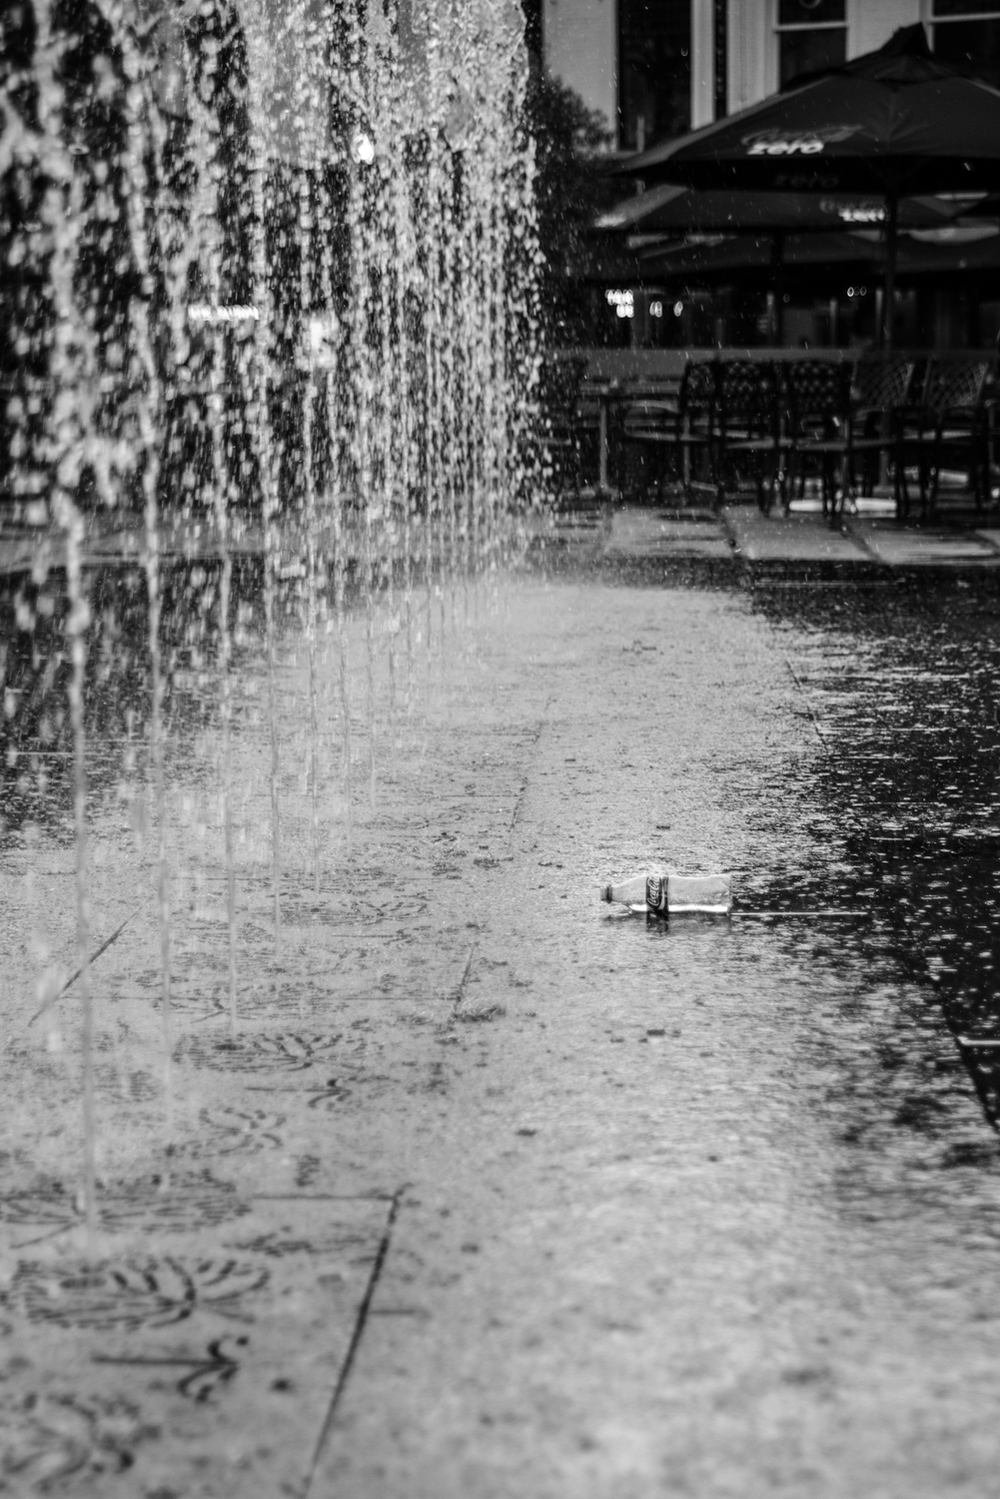 fotowalk_tilburg-56.jpg